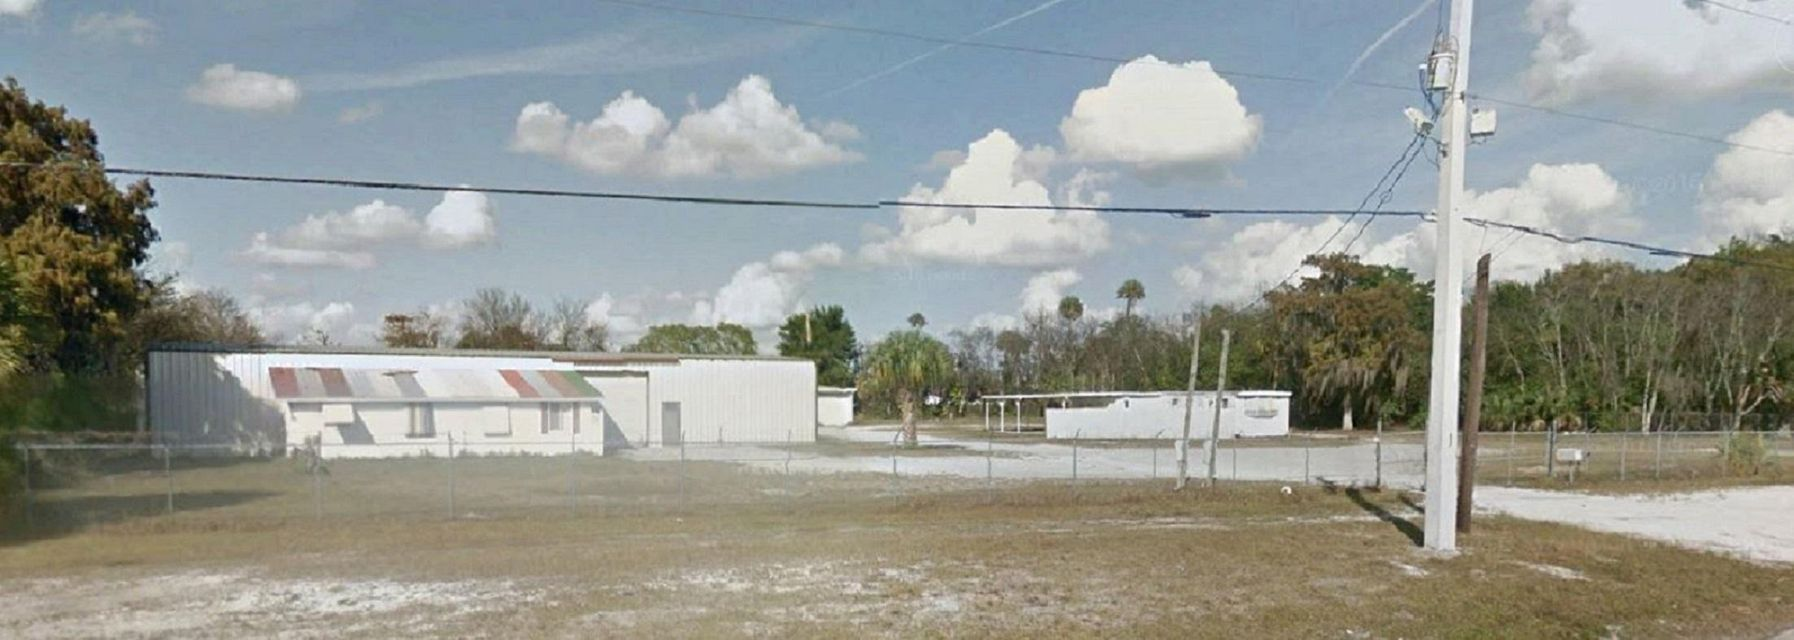 2625 Us Highway 441, Okeechobee, FL 34974